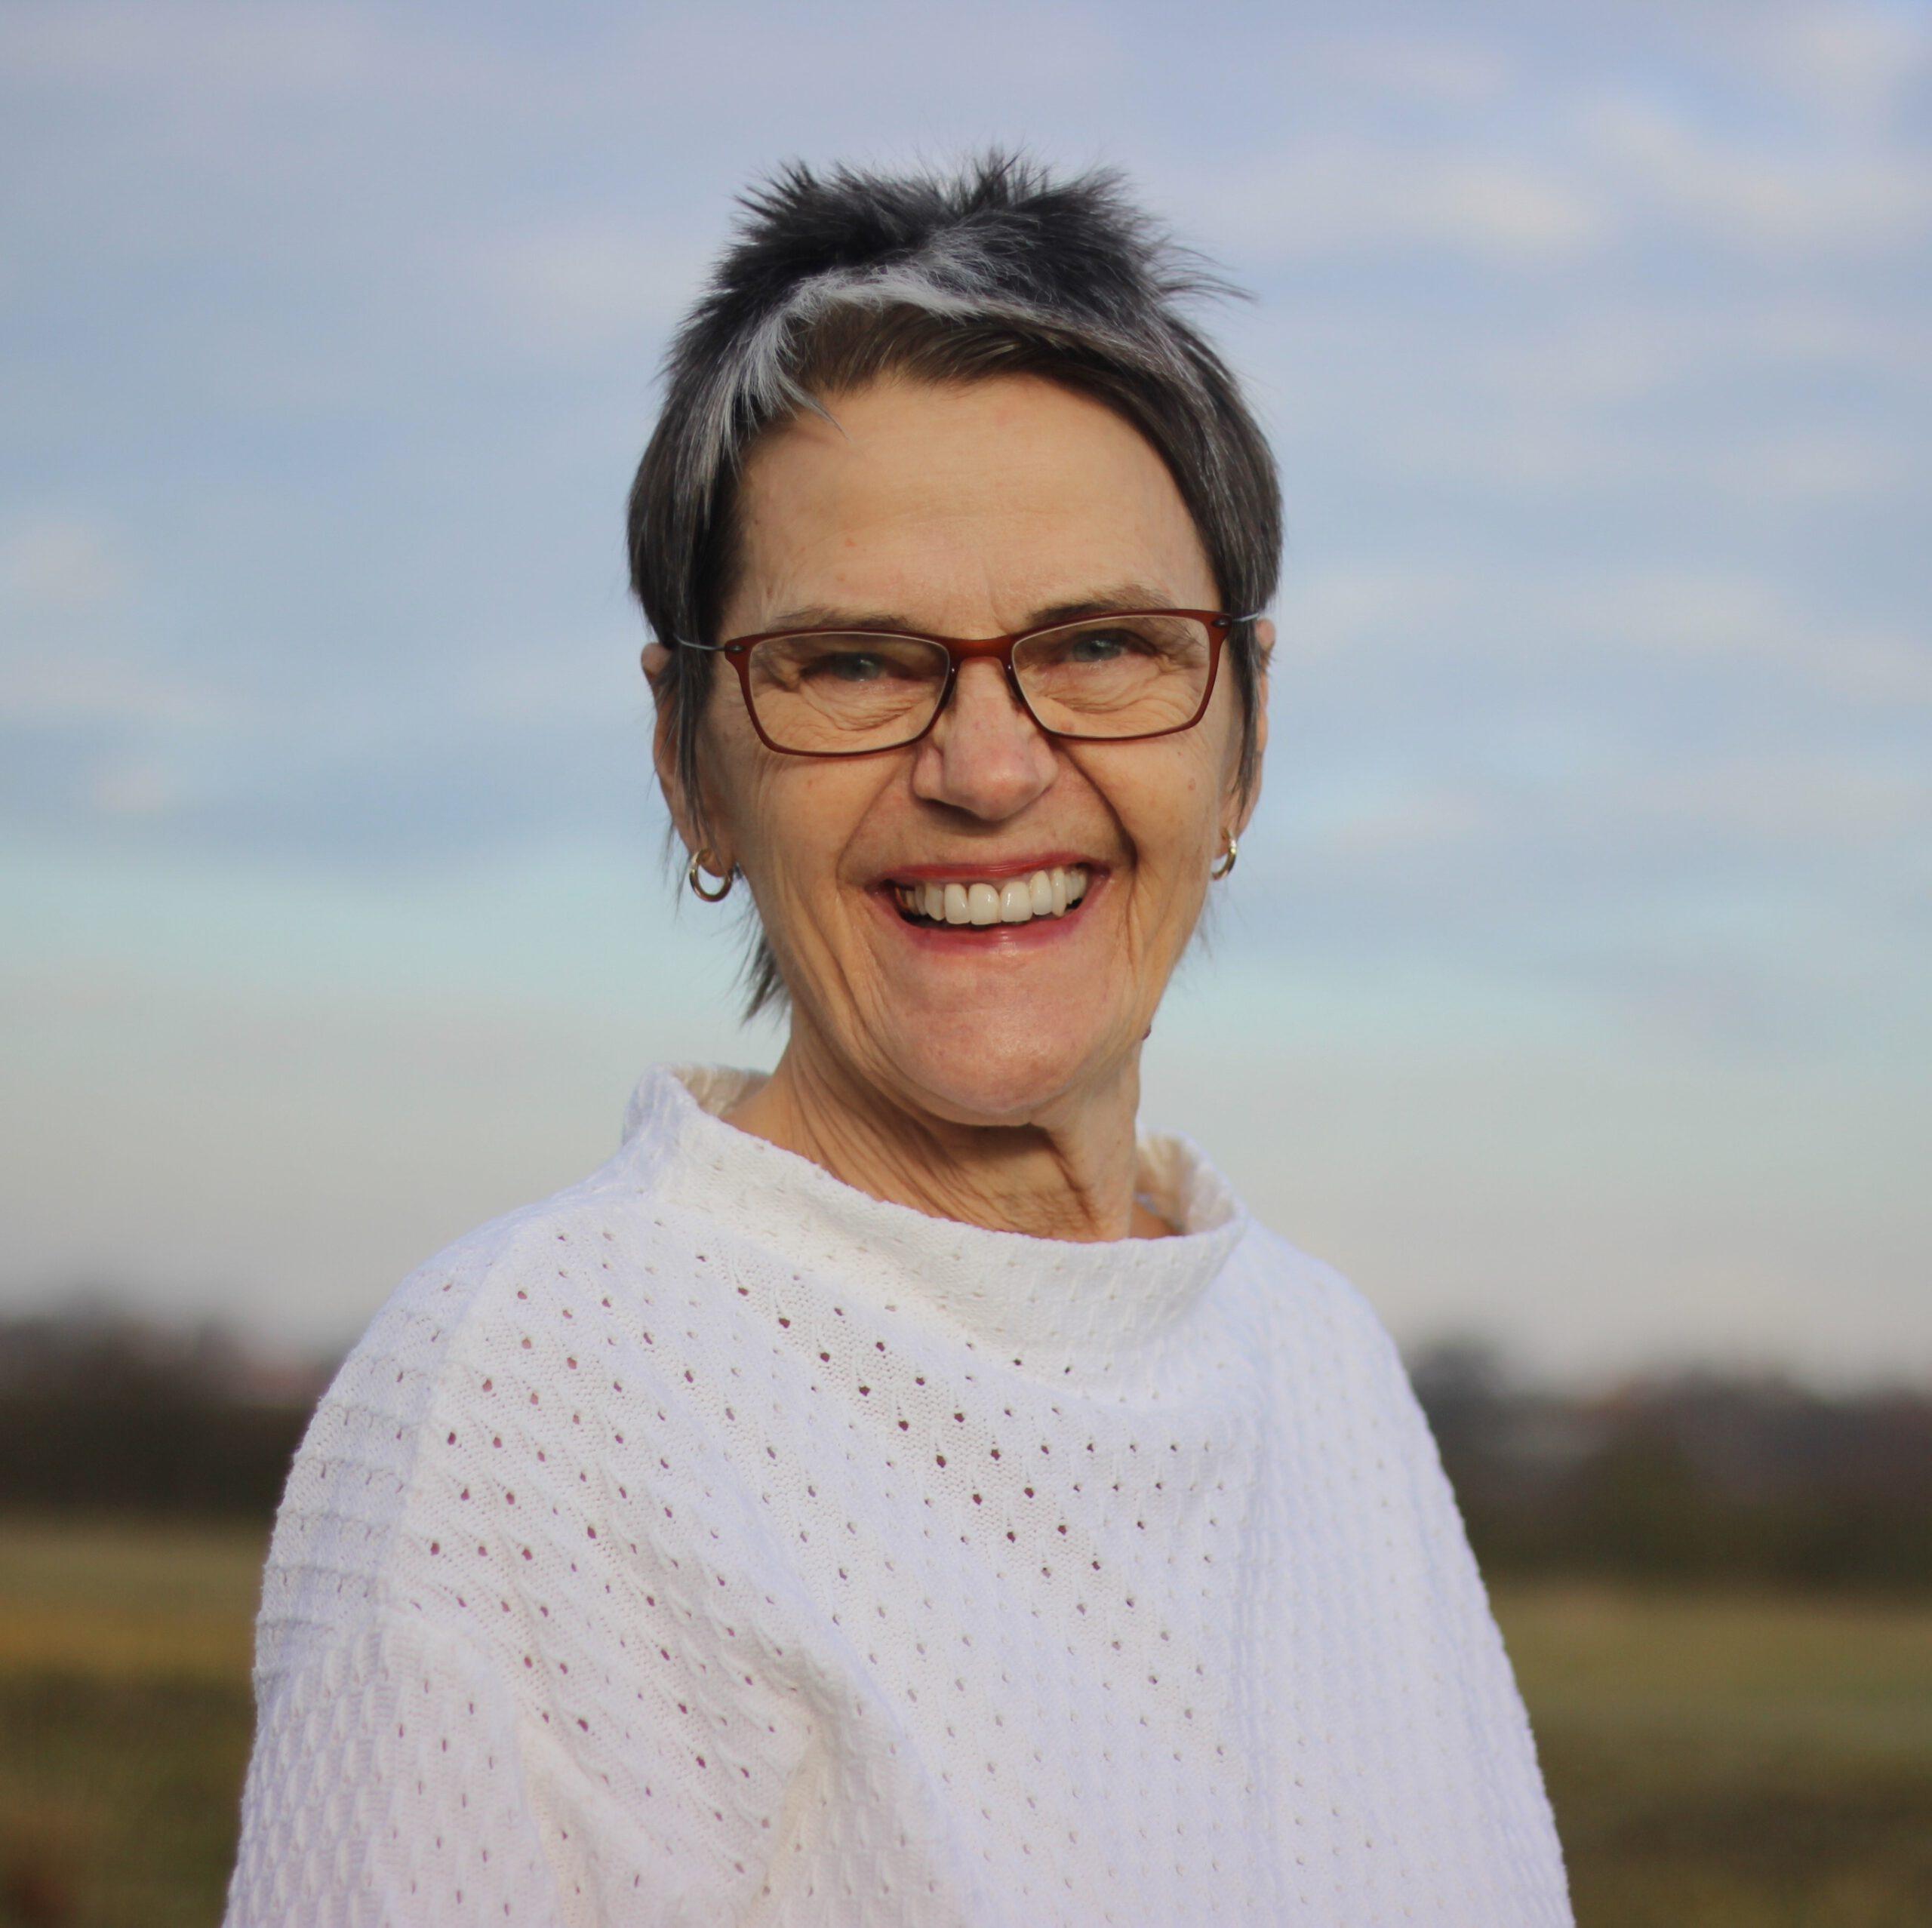 Dr. Karla Jessen